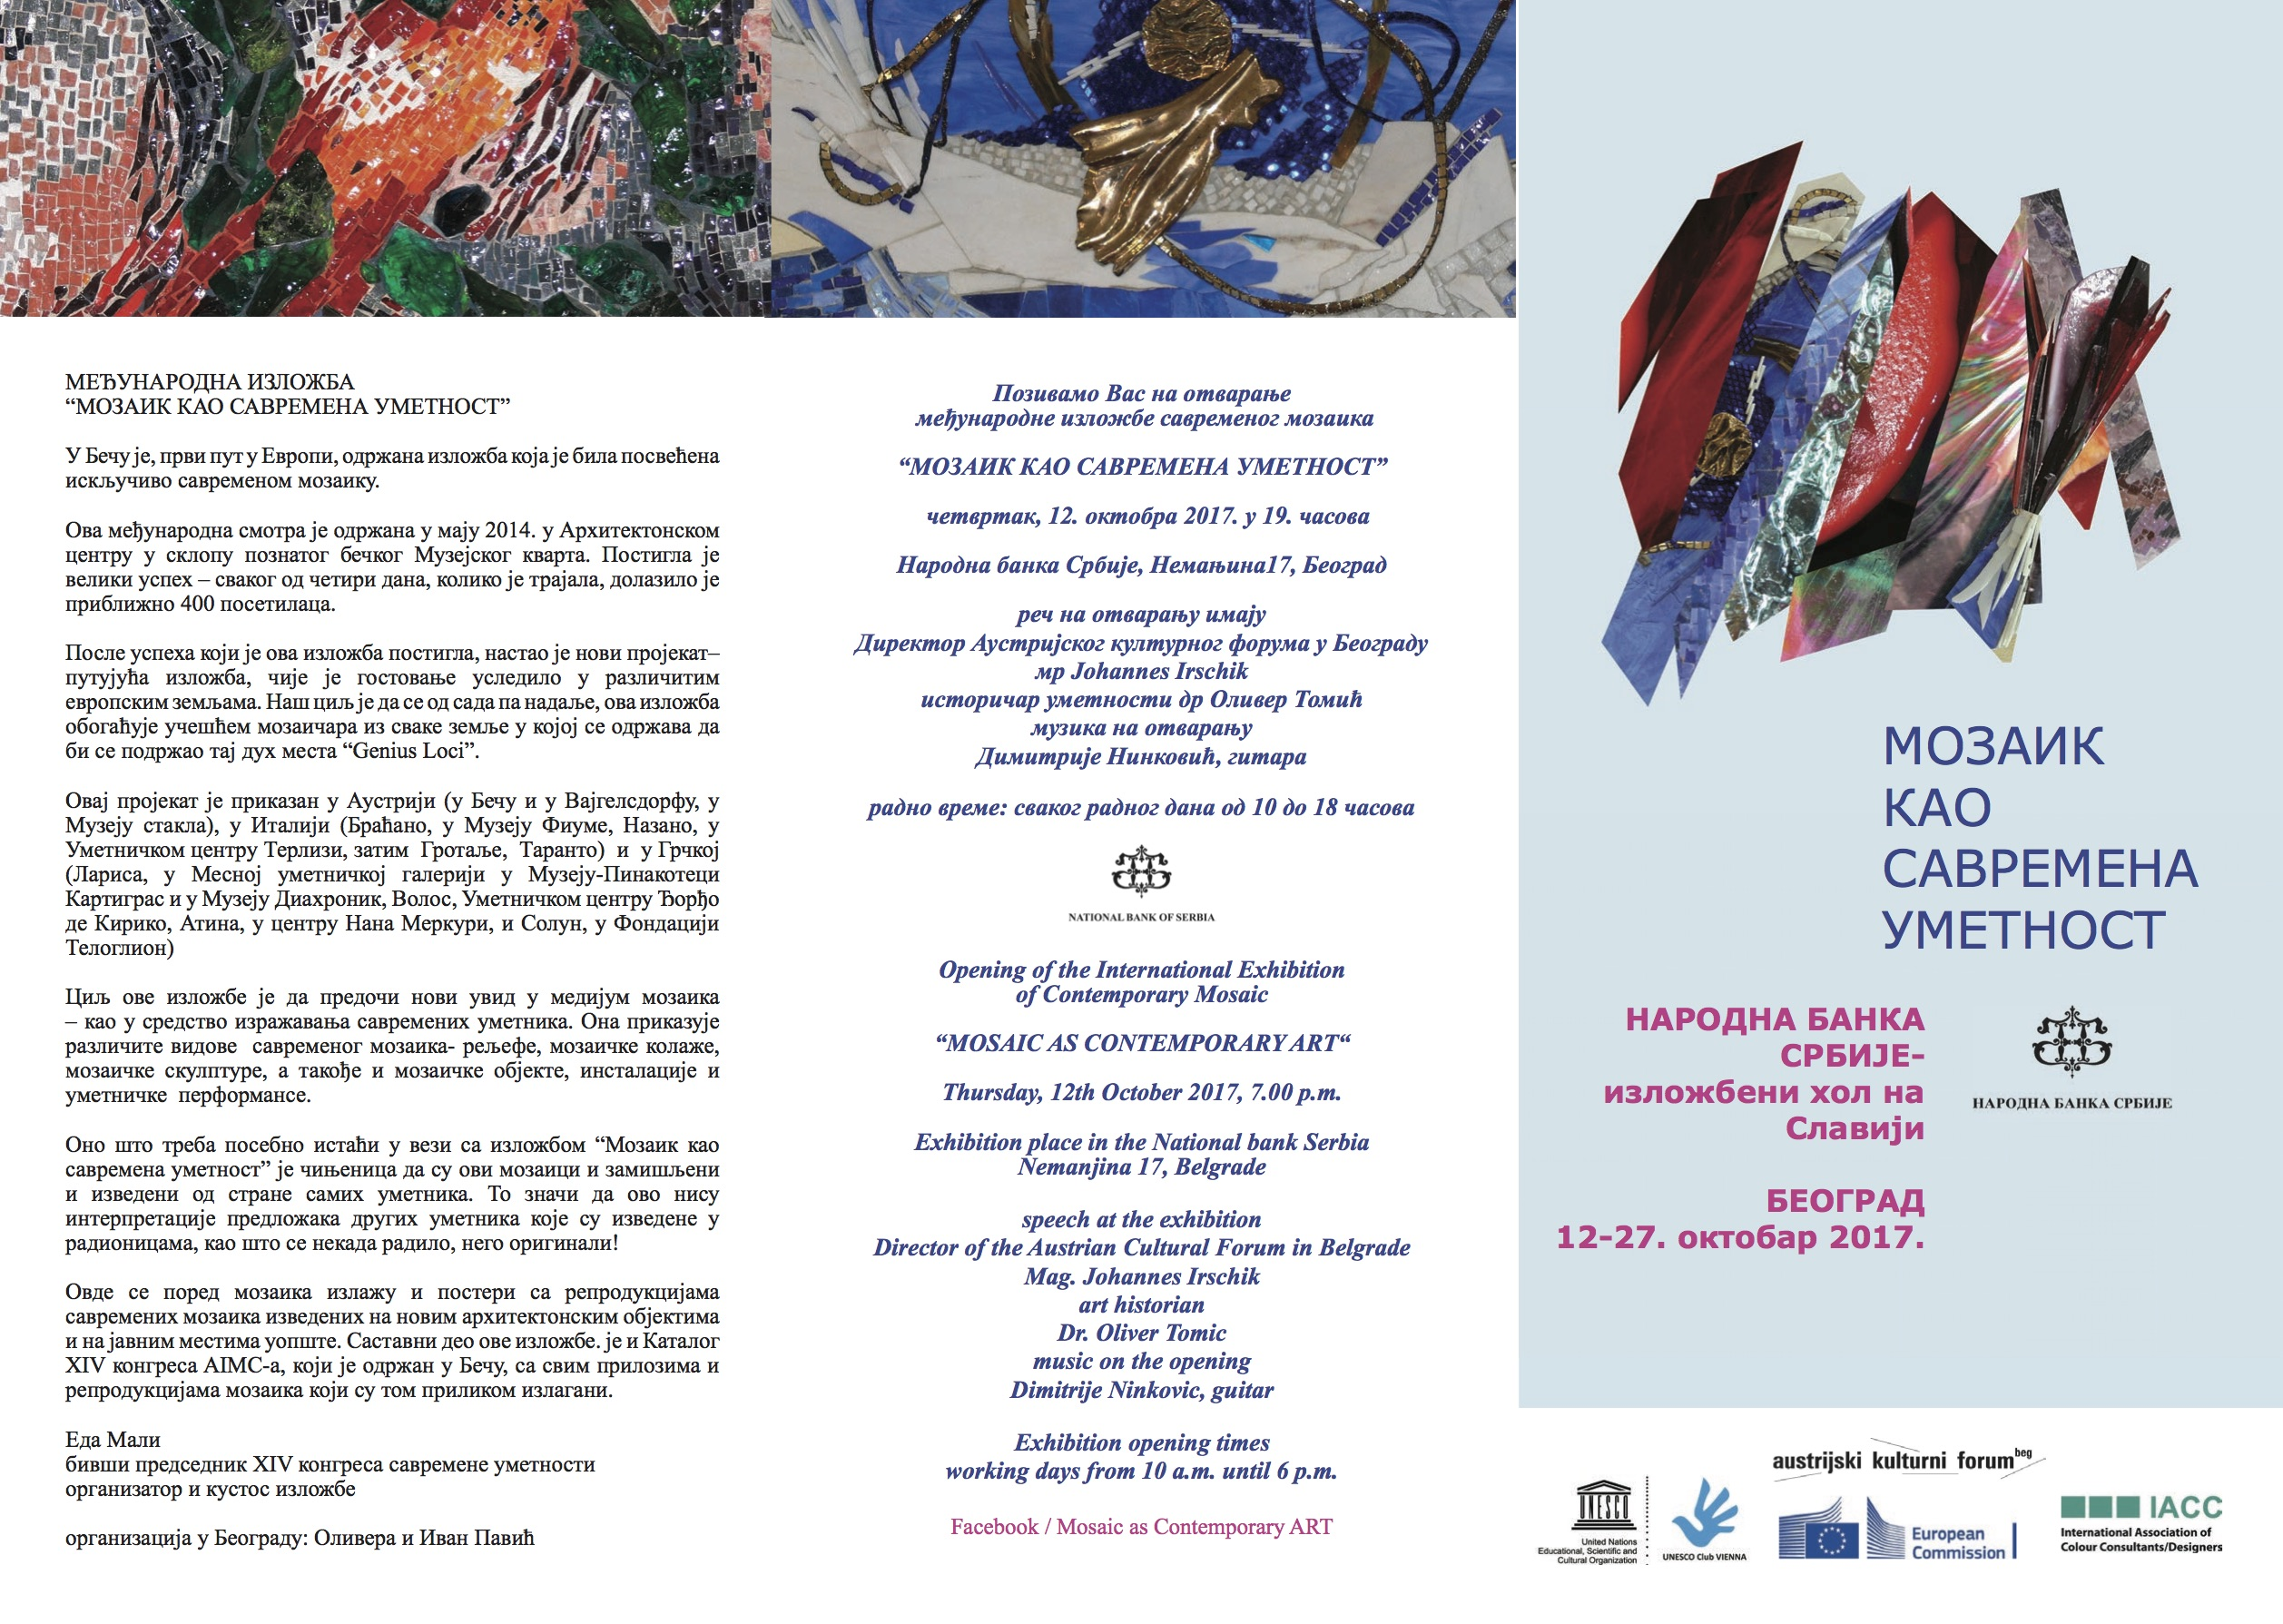 Laêtitia-Ambroselli-Expo-international-Belgrade